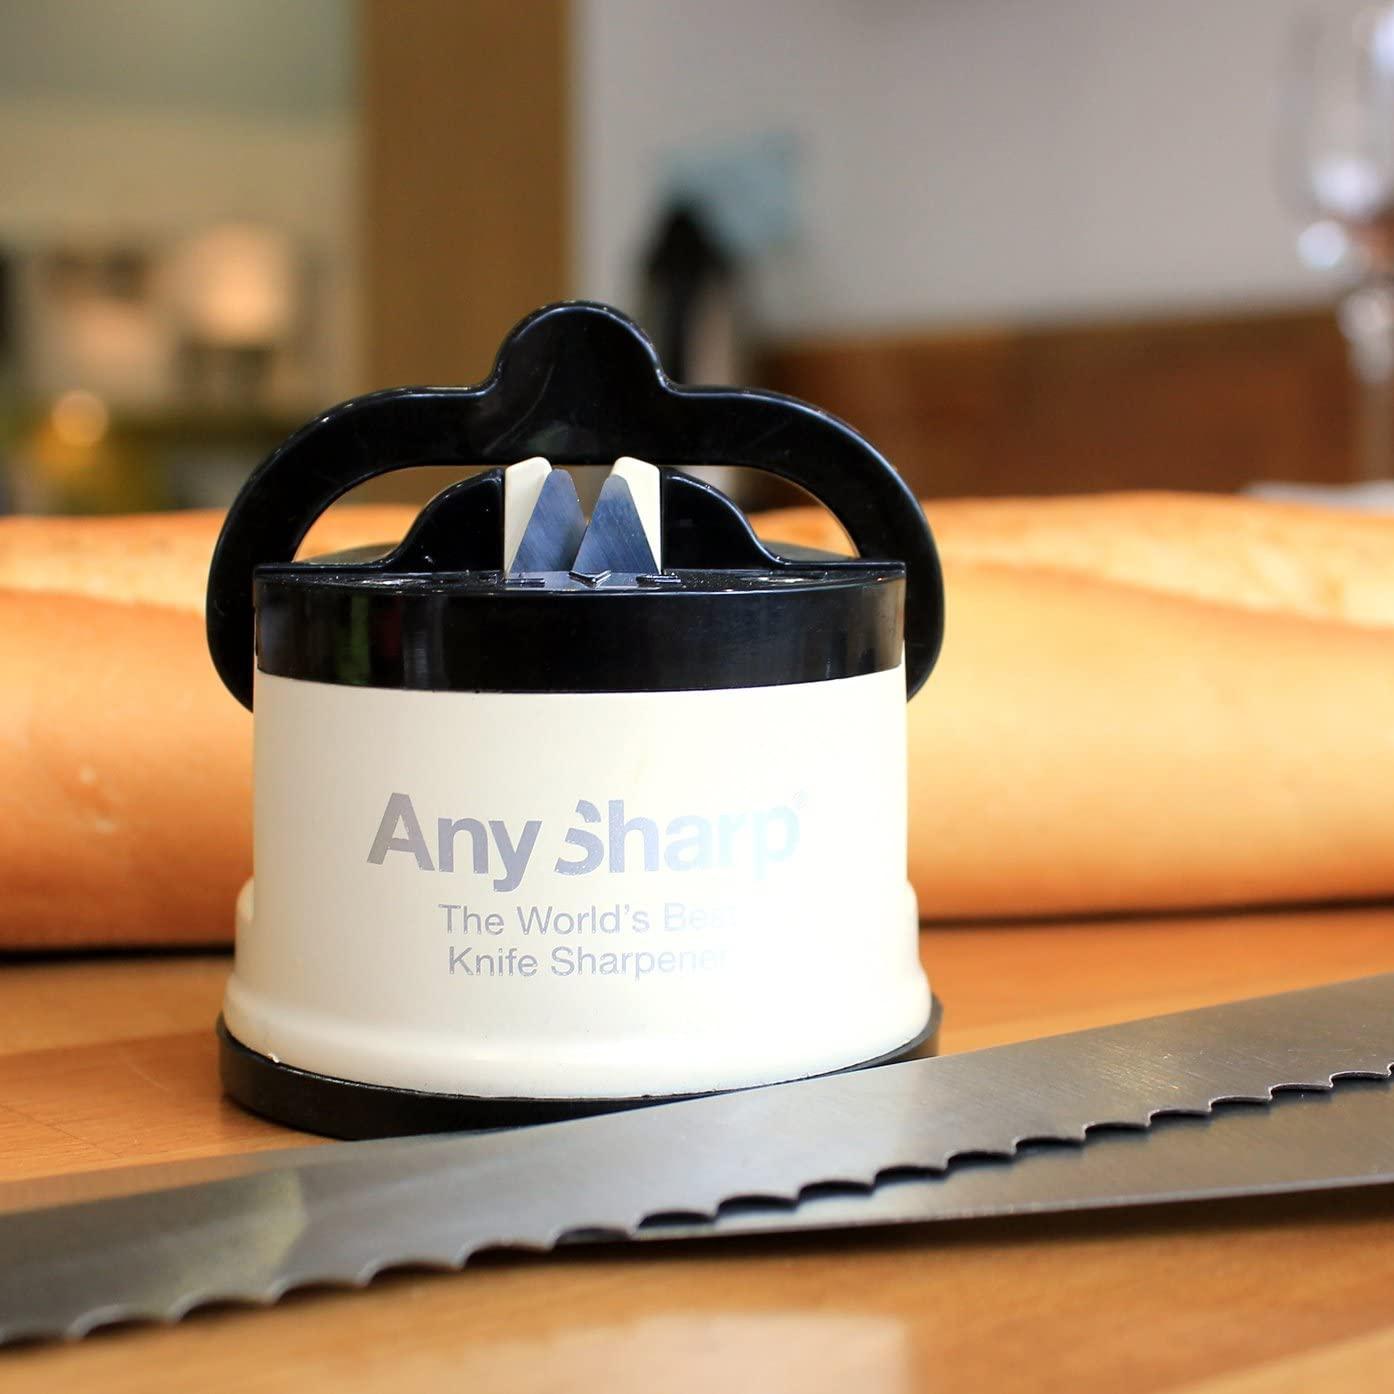 AnySharp Pro Knife Sharpener Review